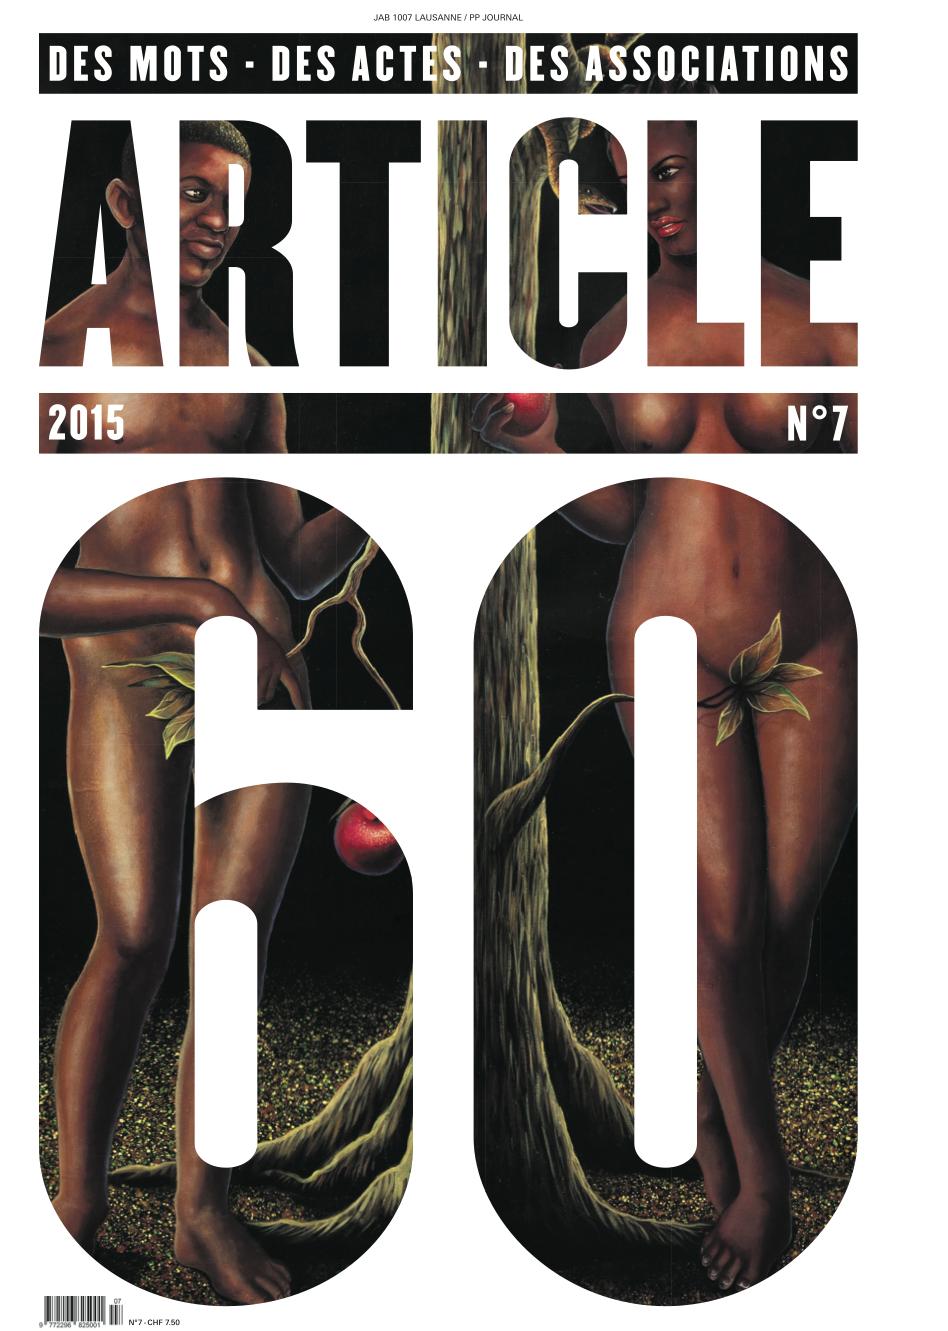 Article 60 N°7_ UNE